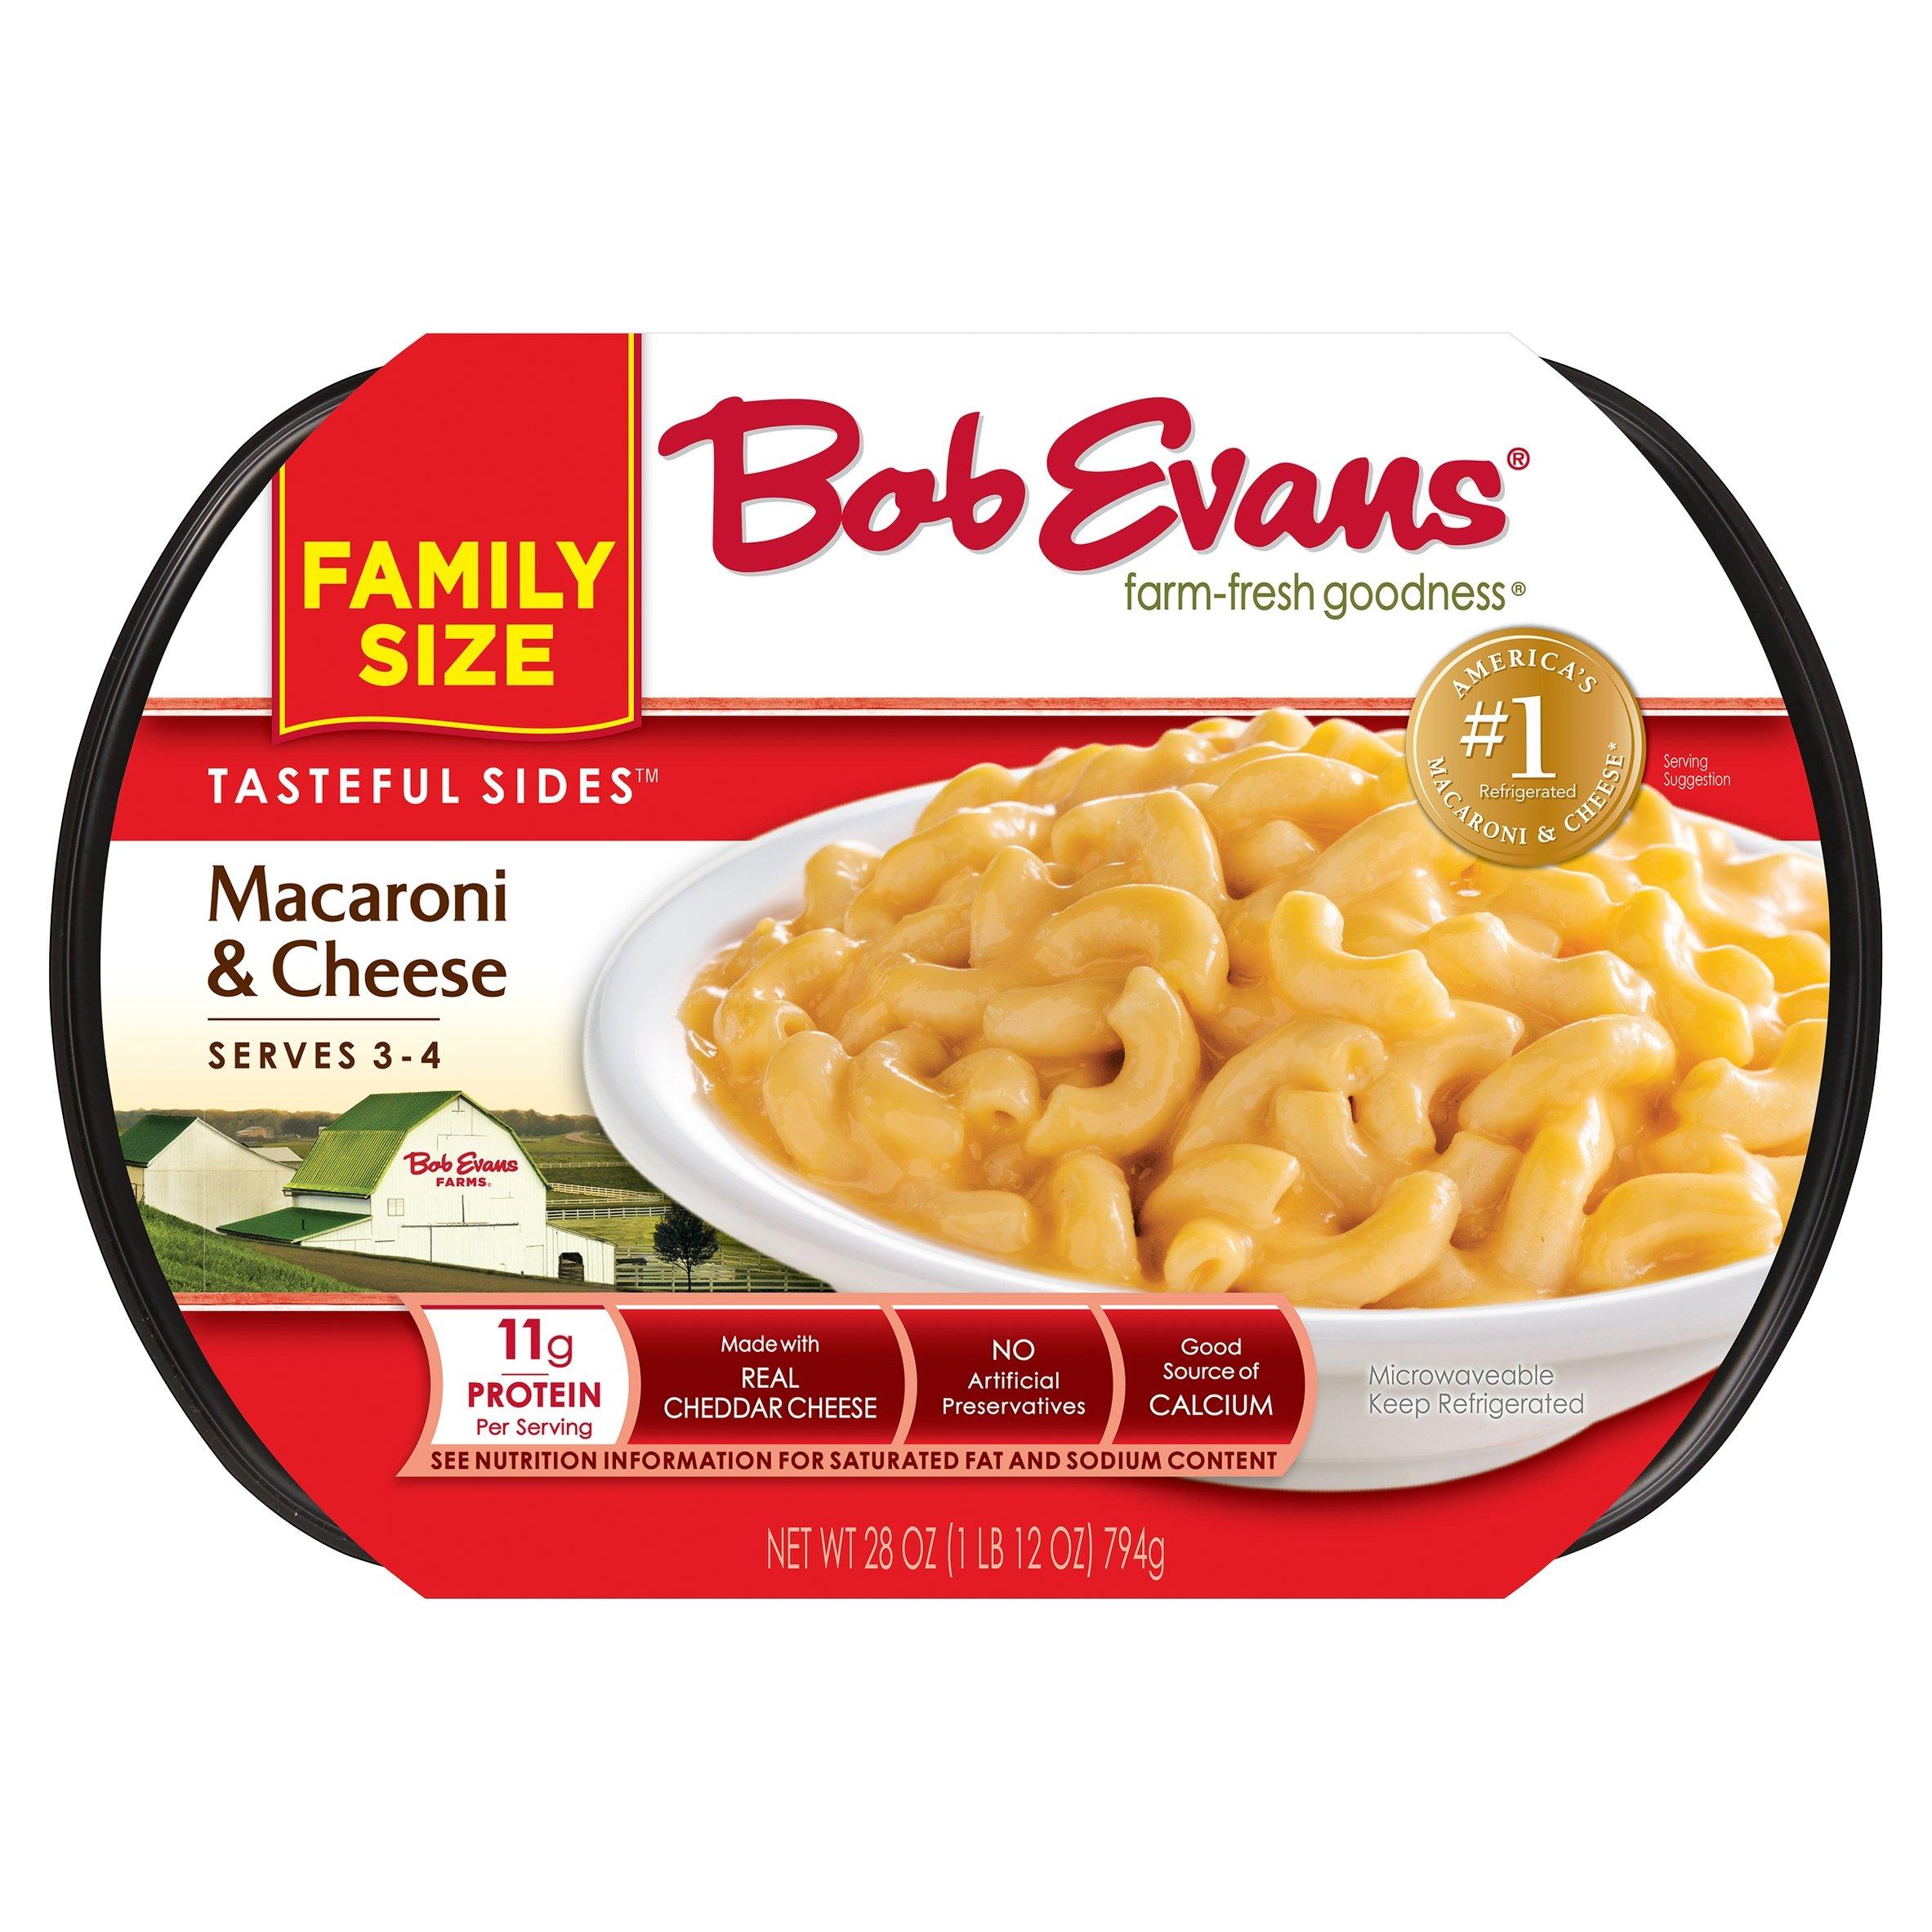 Bob Evans Tasteful Sides Macaroni & Cheese Family Size, 28 oz - Walmart.com